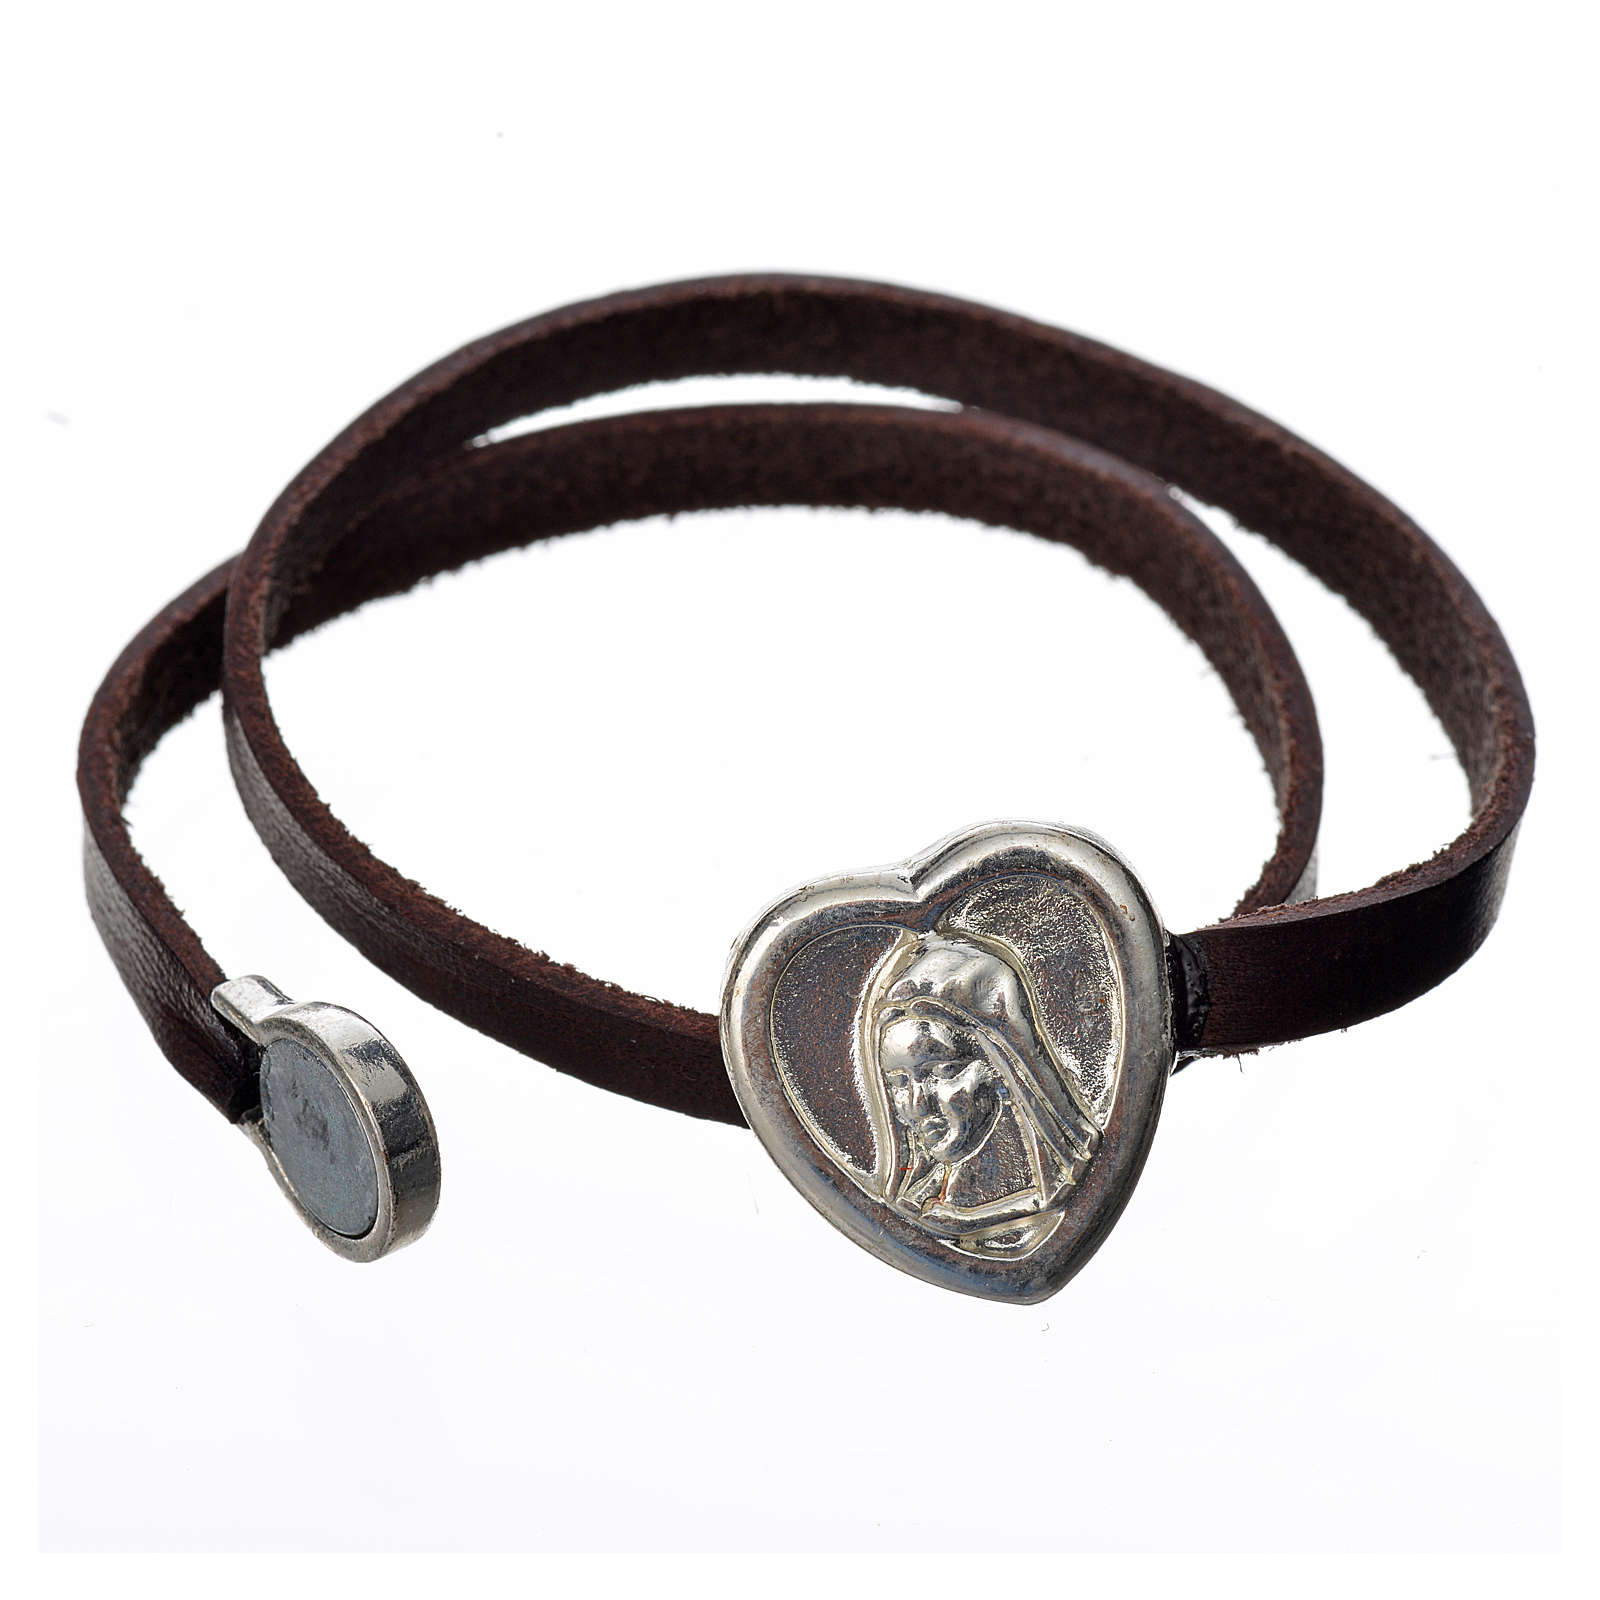 Bracelet in dark brown leather with Virgin Mary pendant 4